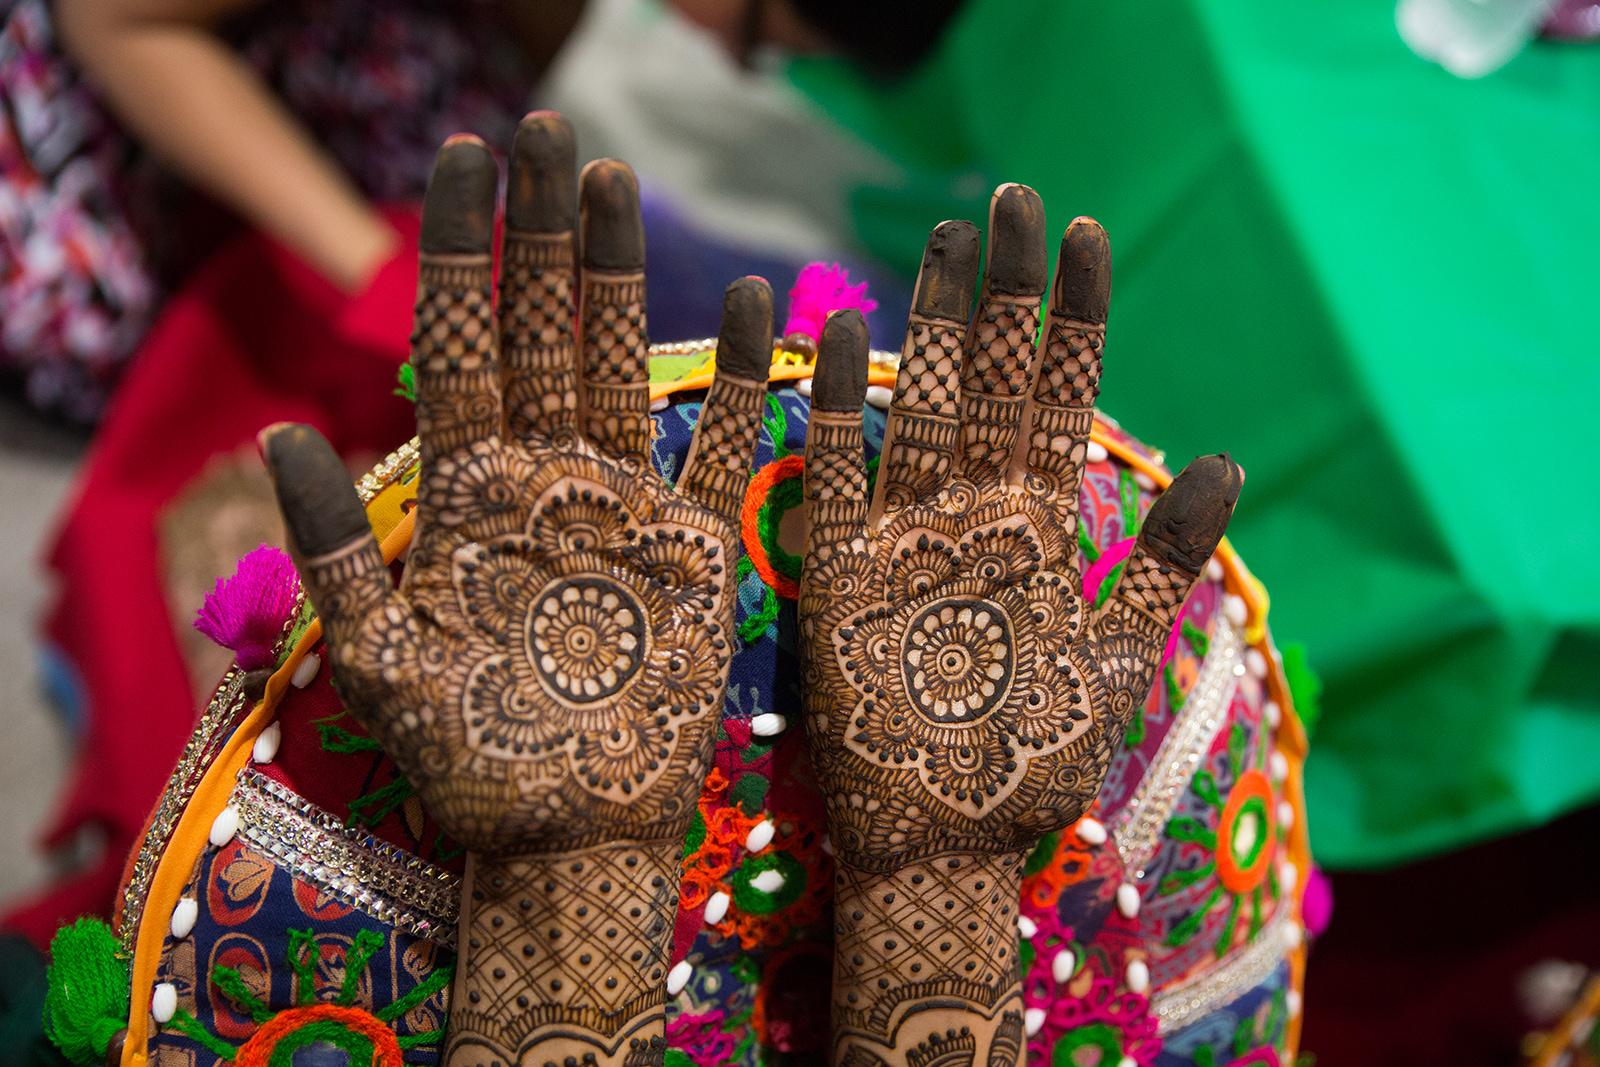 Le Cape Weddings - Sumeet and Chavi - Mendhi-2.jpg